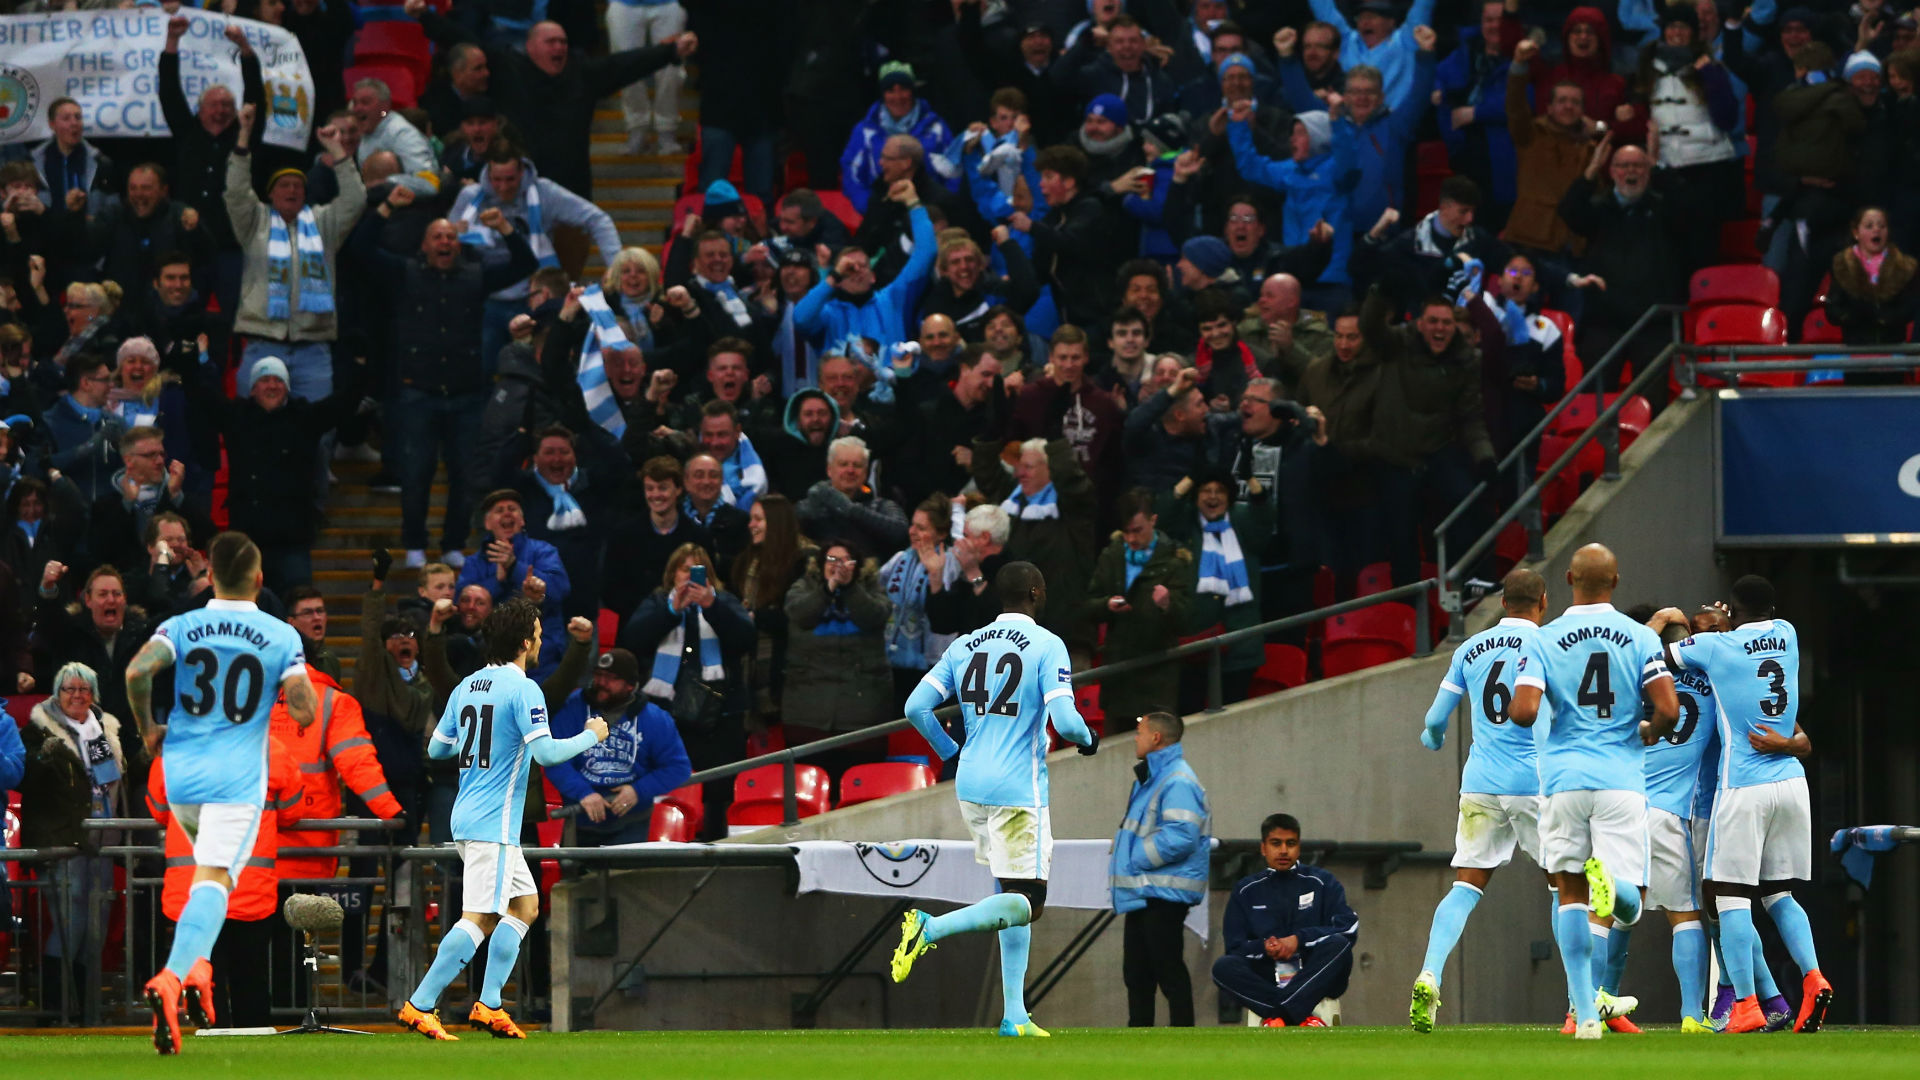 «Манчестер Сити» - «Ливерпуль» 1:1, обзор матча